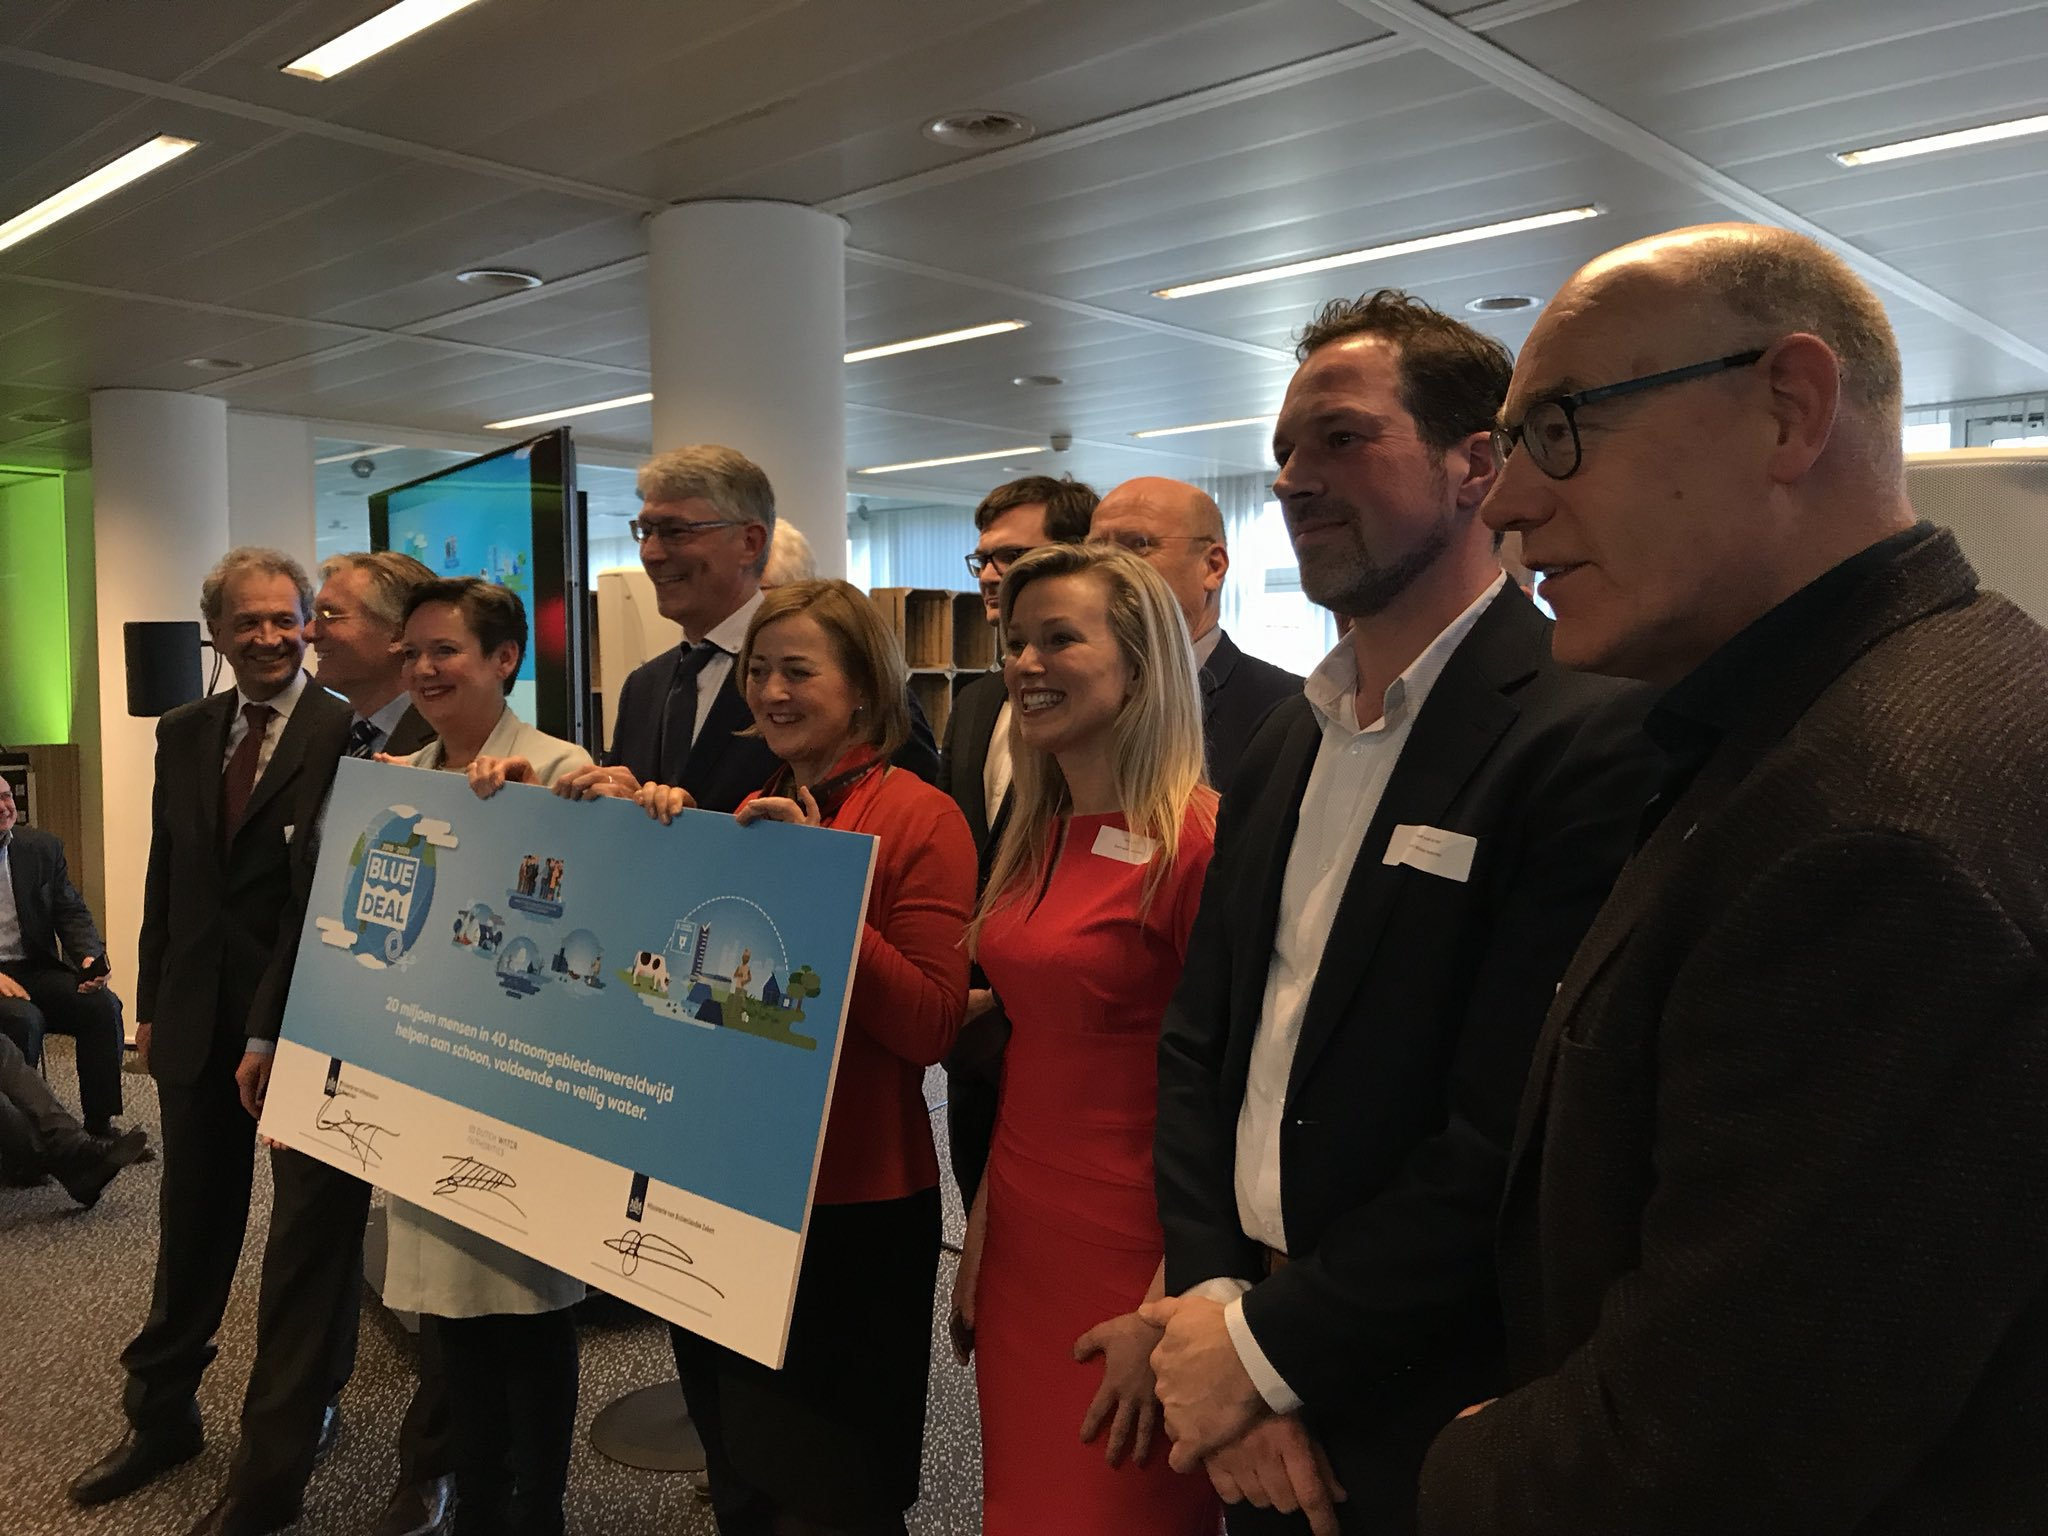 Unie van Waterschappen/ Blue Deal/ Identiteit